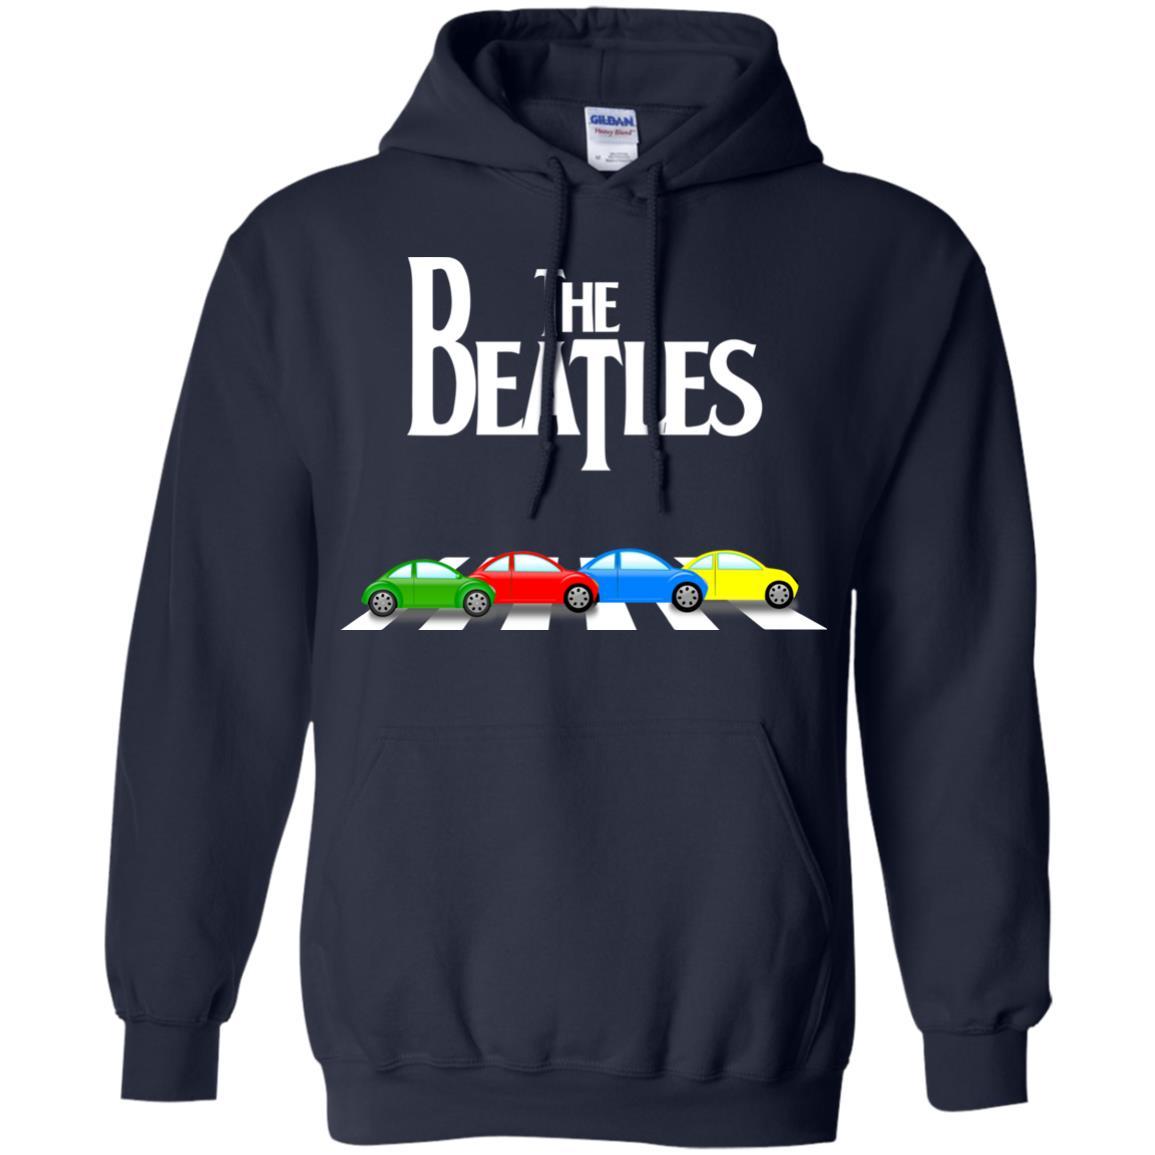 image 331 - The Beatles cars shirt, hoodie, tank